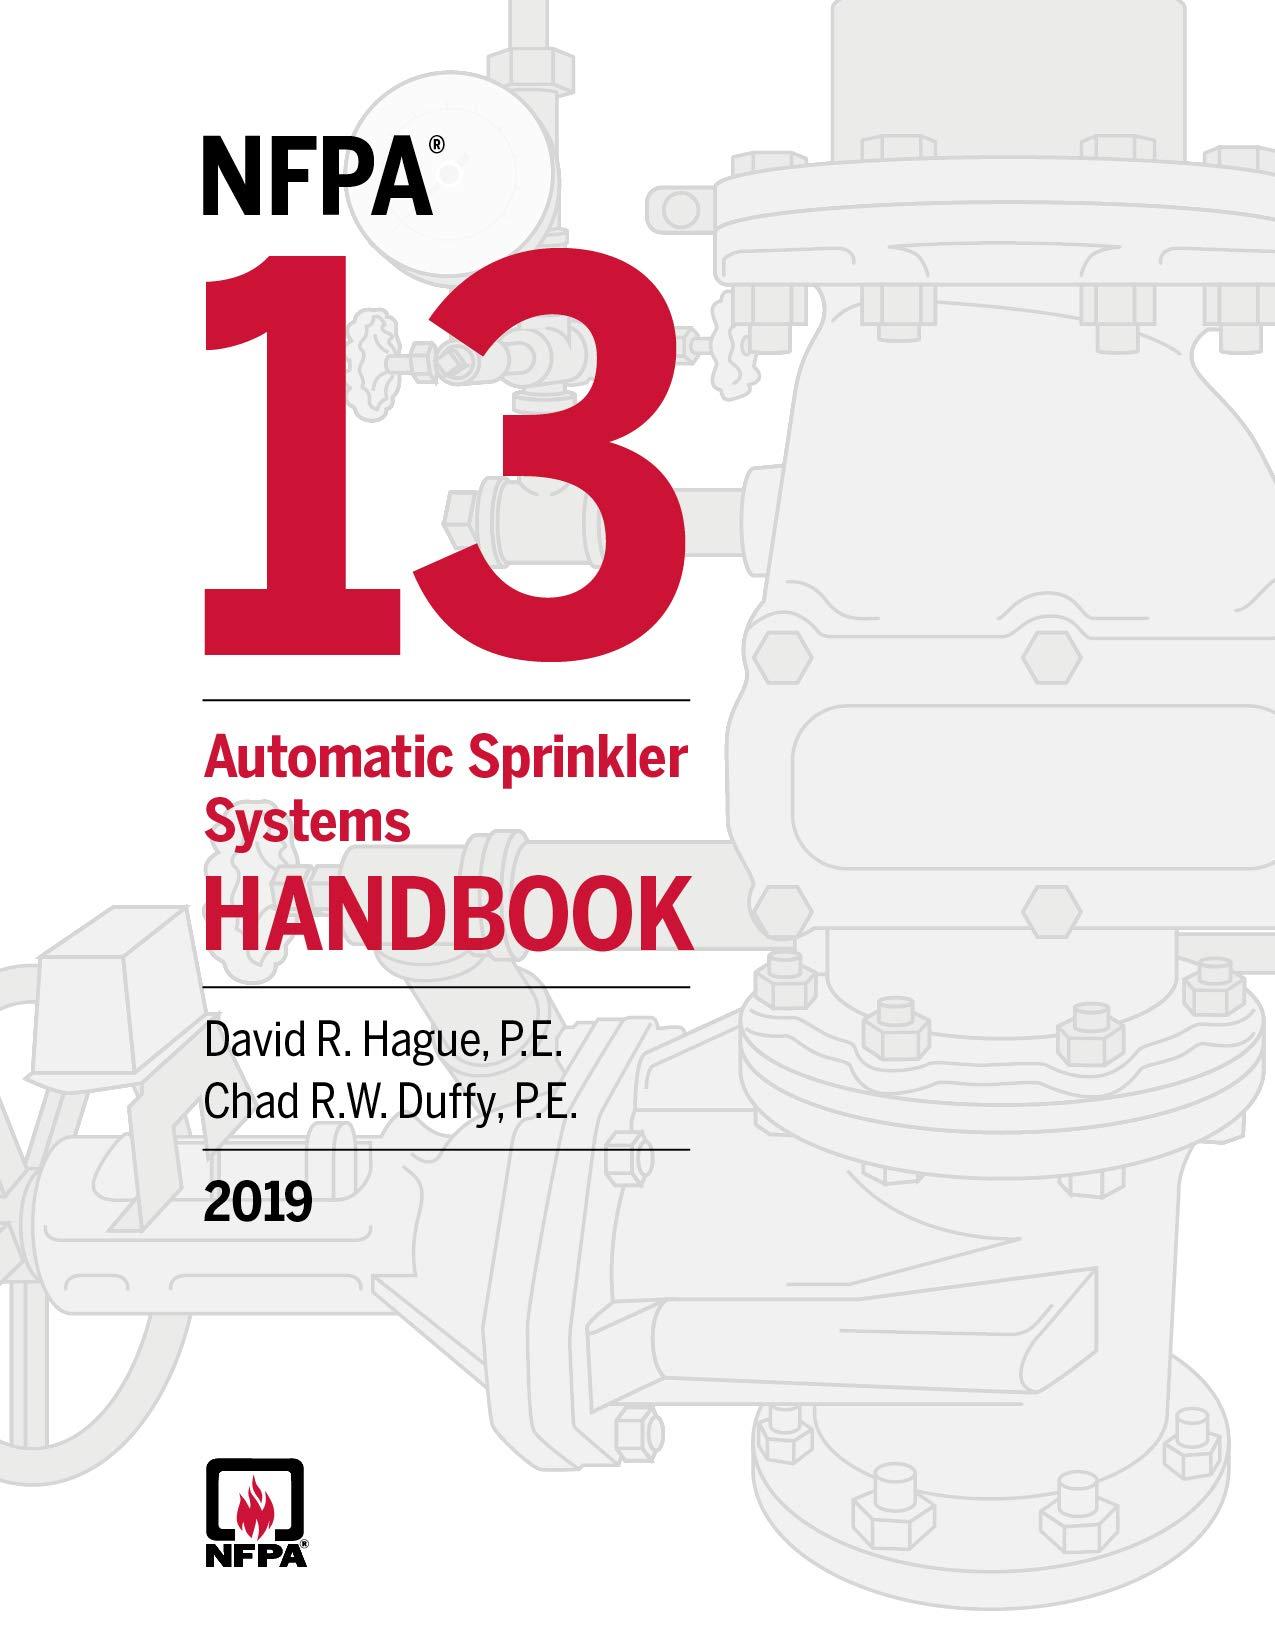 Nfpa 13 Handbook 2019 Pdf